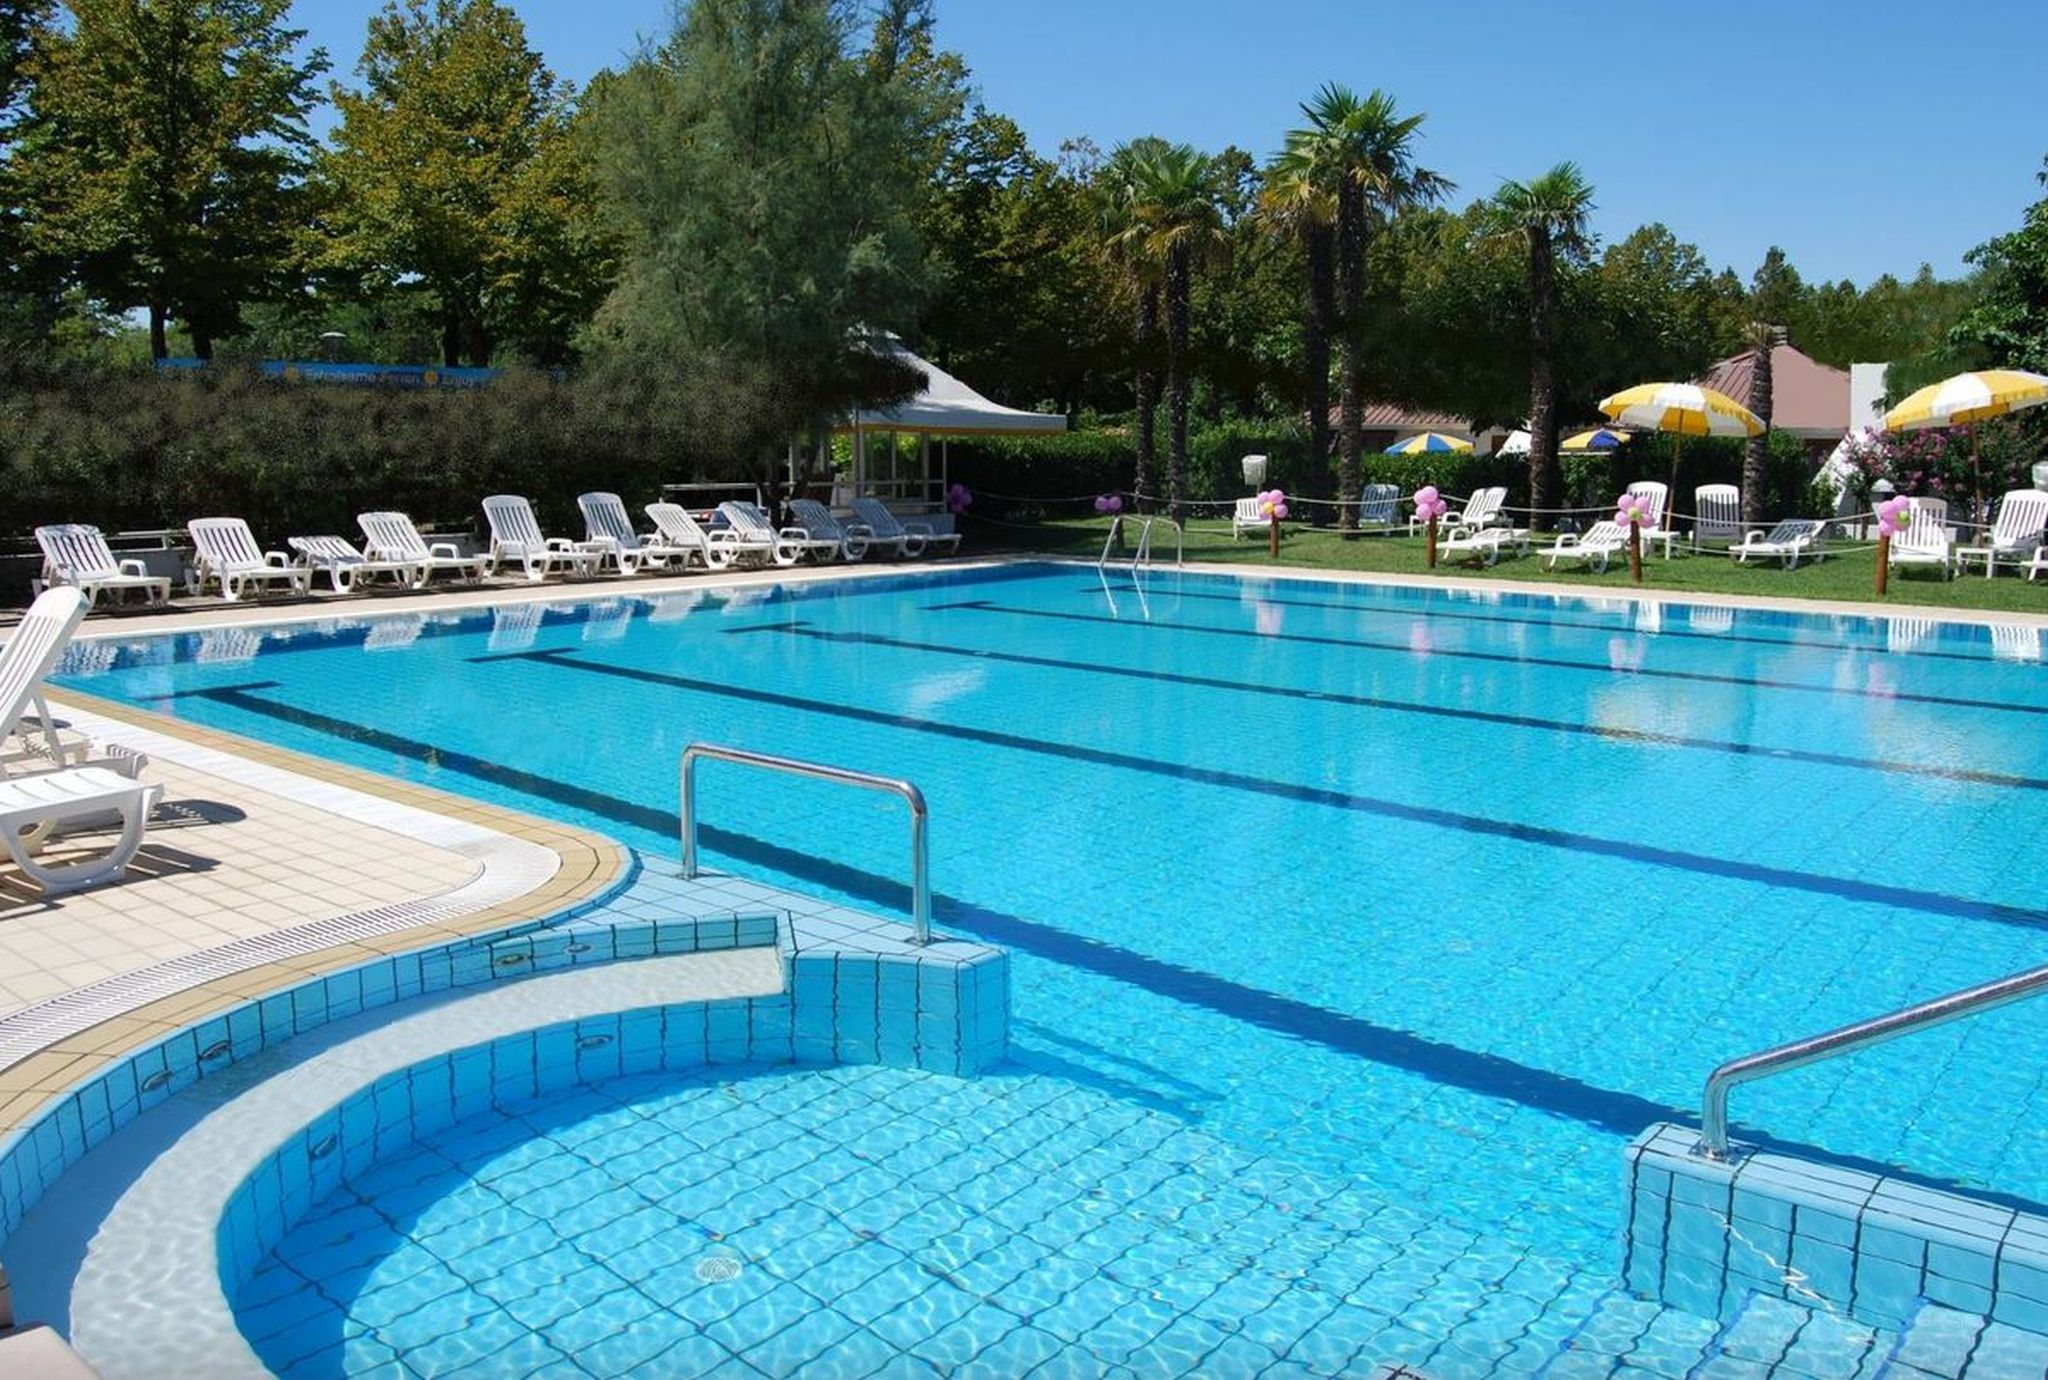 Ferienanlage Los Nidos Wohnung Le Rondini Erdgeschoss AGALB 2383